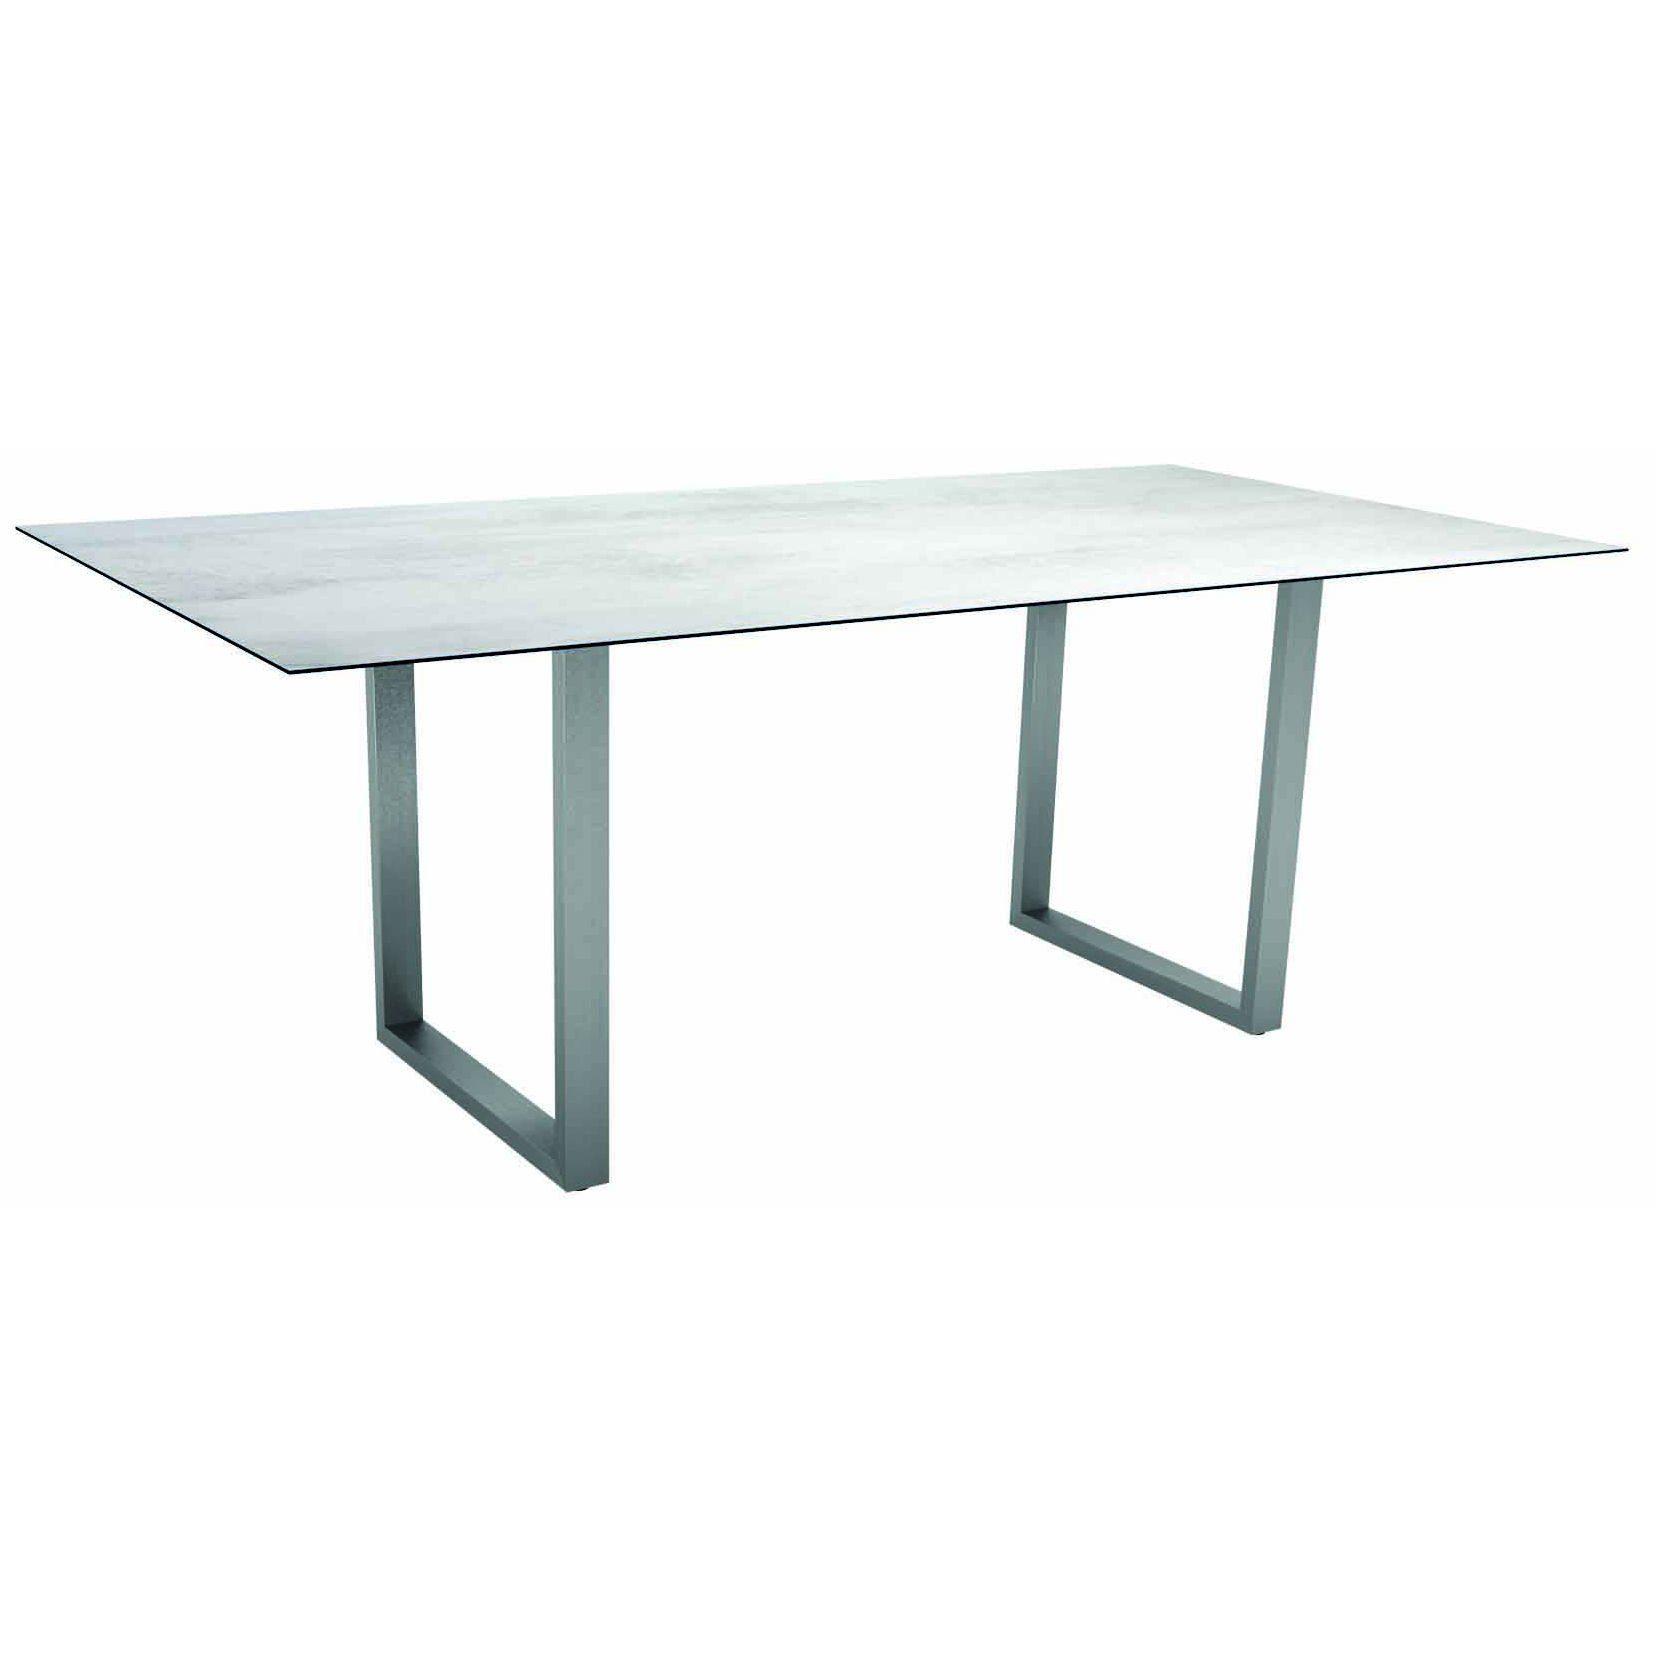 stern kufentisch aluminium hpl 200x100 cm. Black Bedroom Furniture Sets. Home Design Ideas